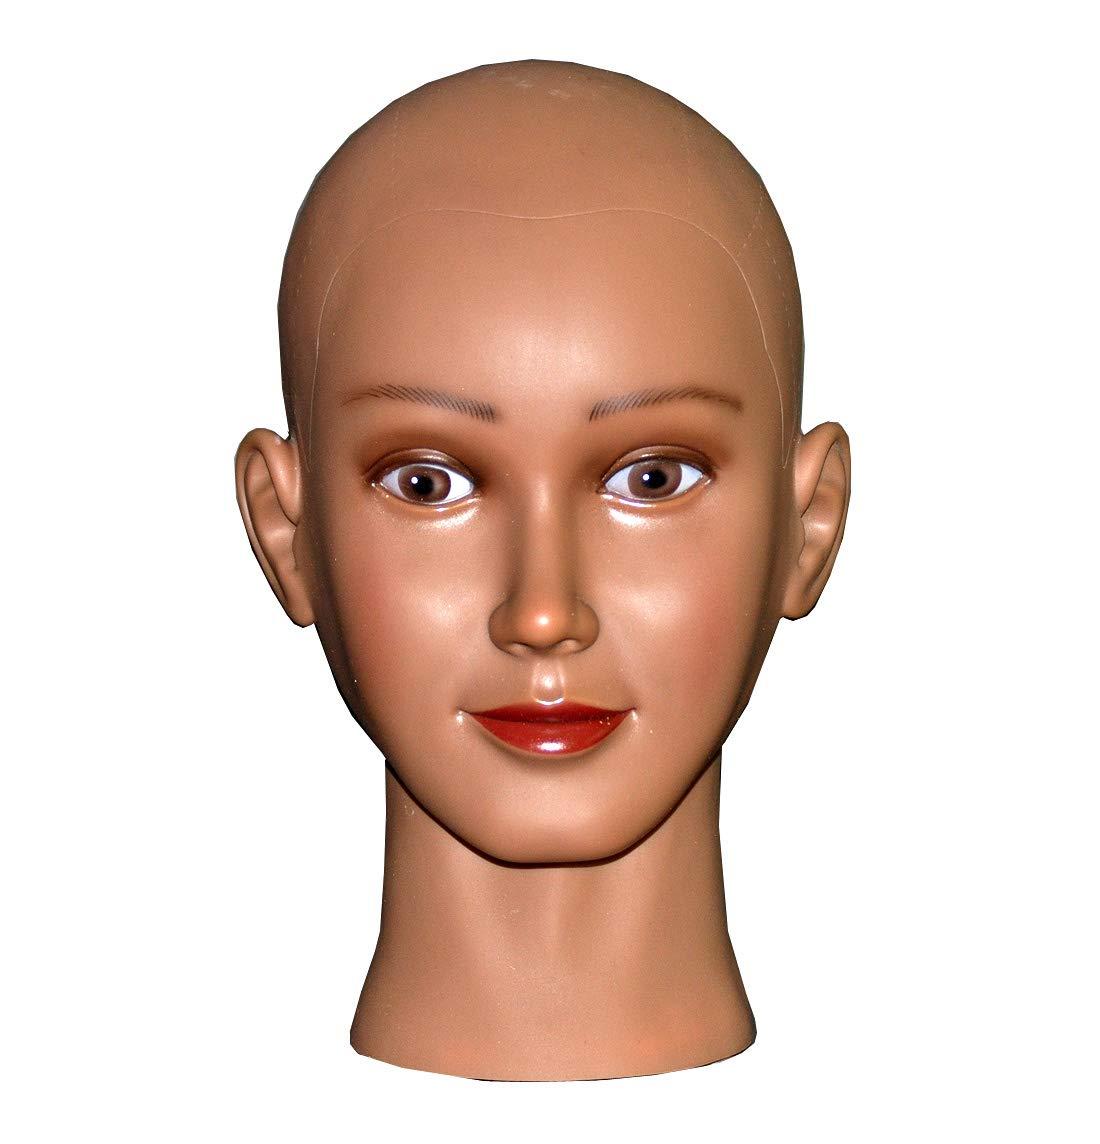 Ladella Beauty Cosmetology Wig Stand Block Bald Female Makeup Manikin Head for Wigs Making